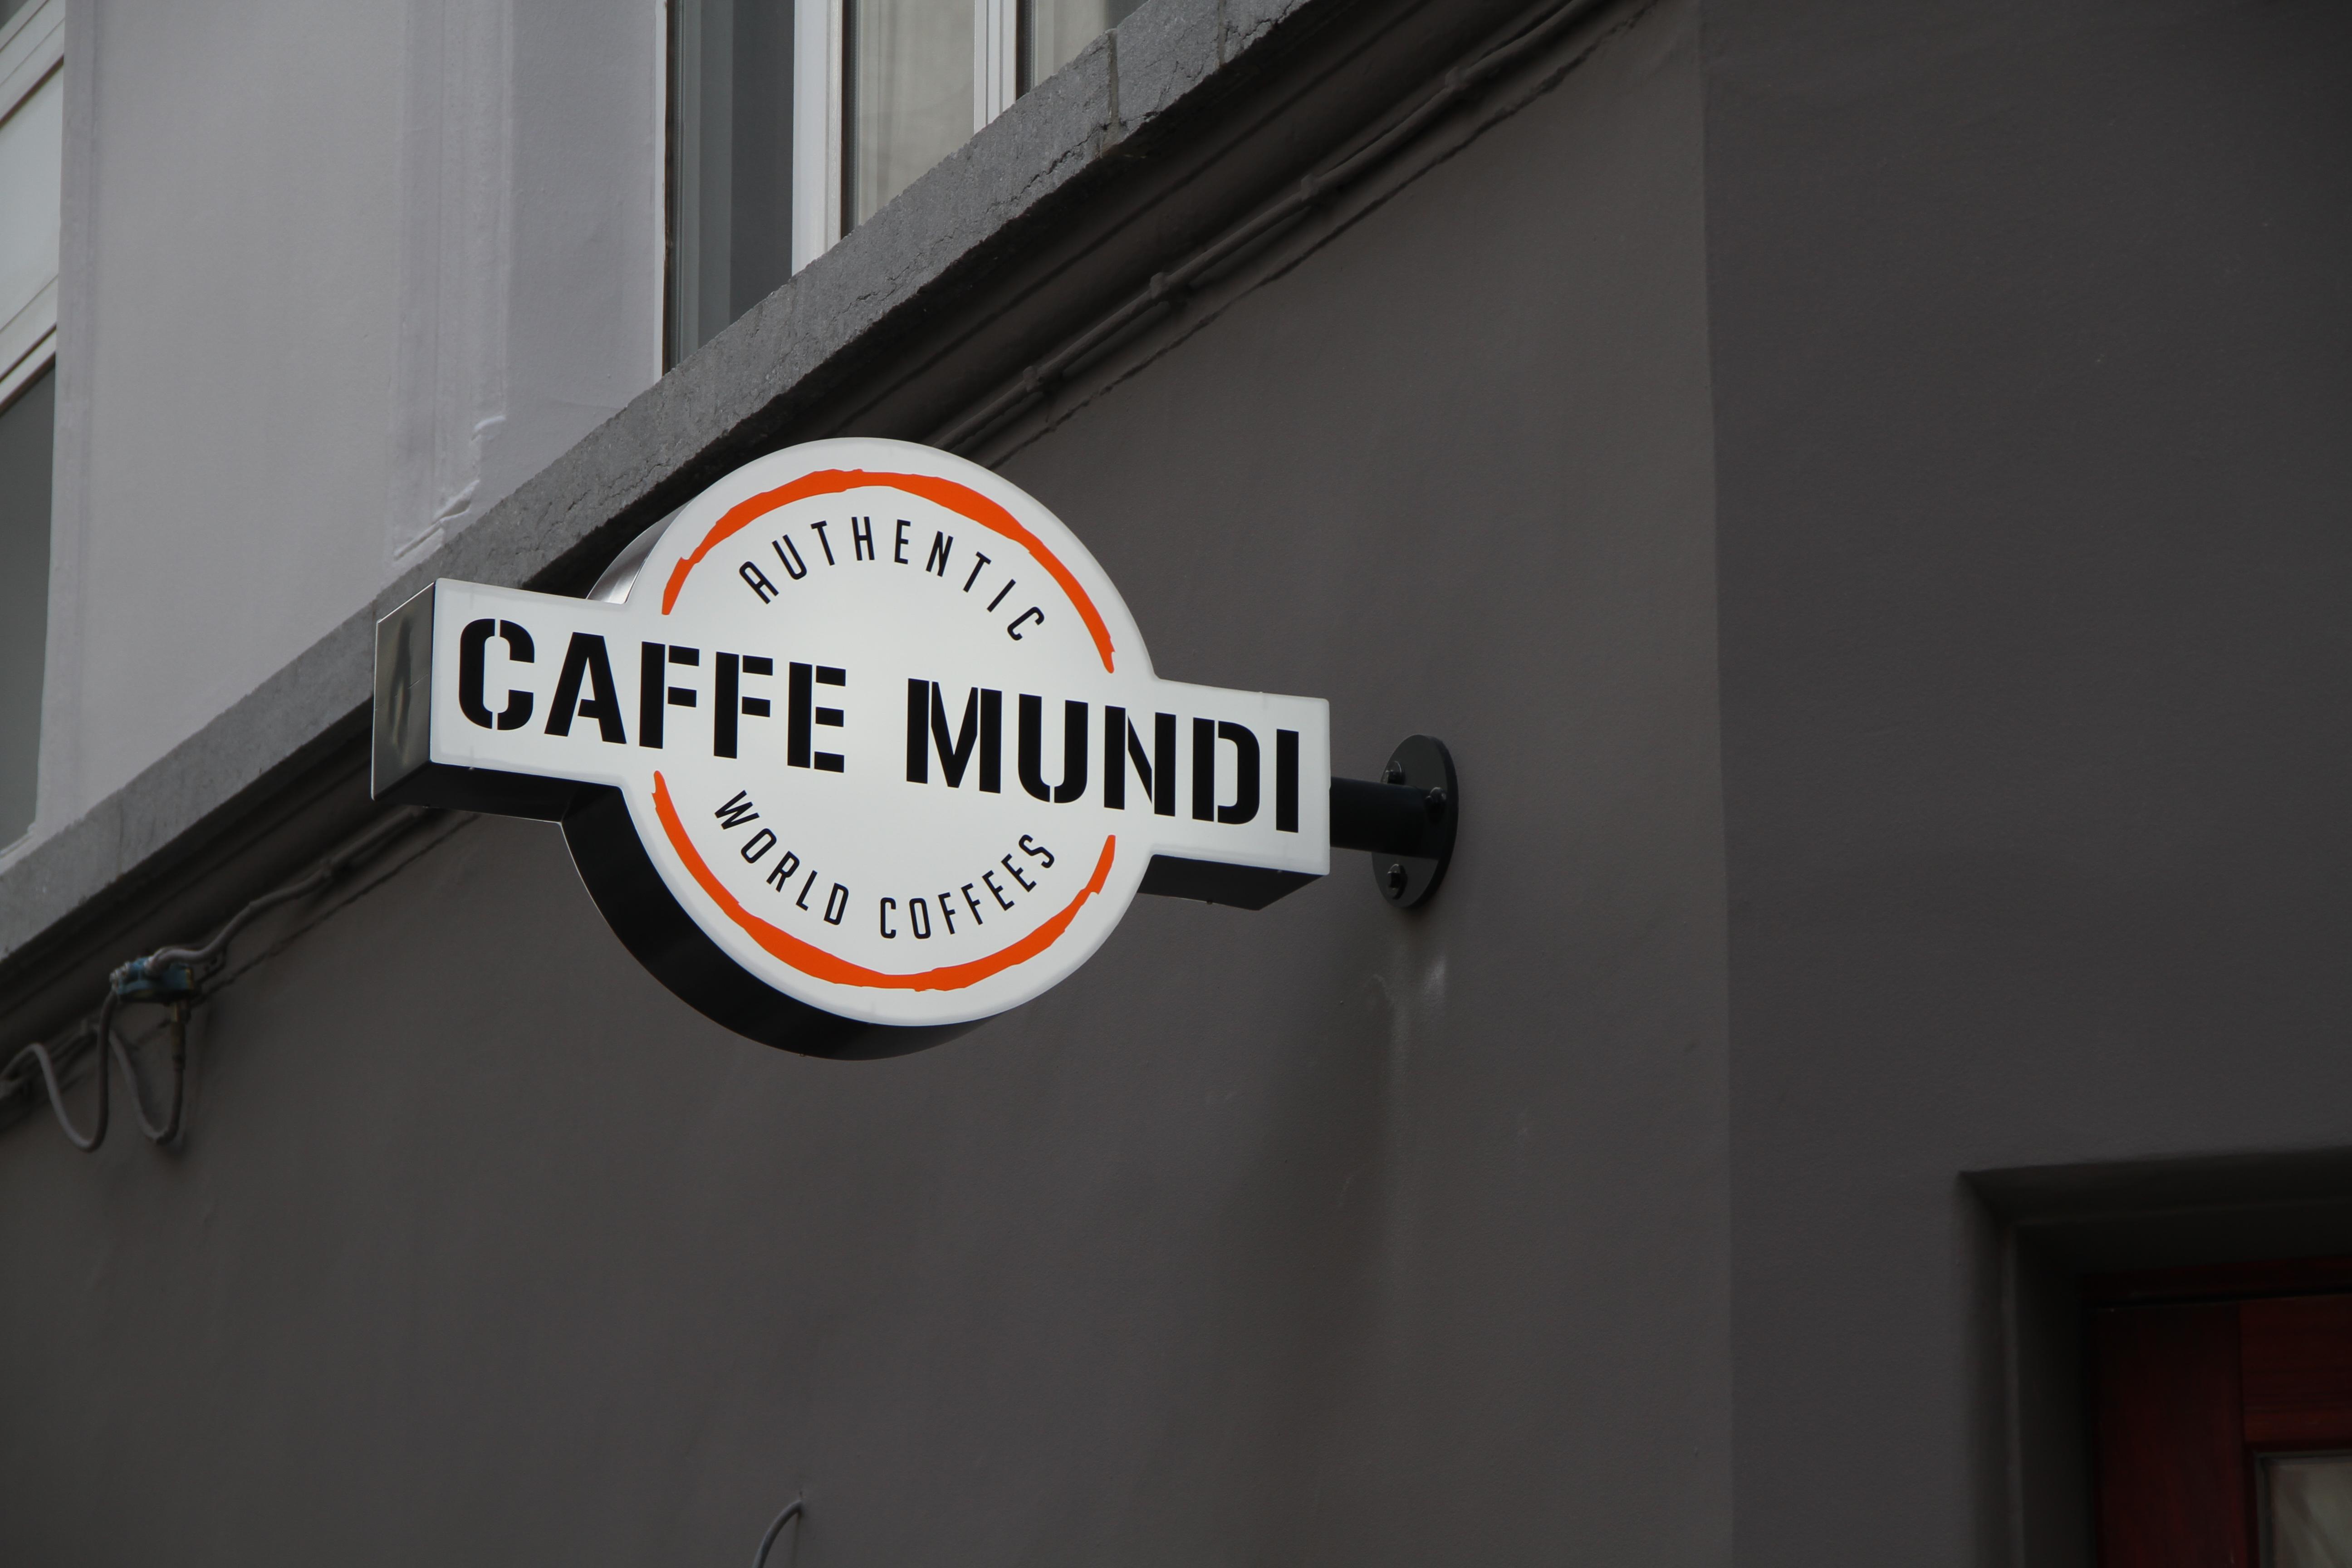 Lichtreclame Caffe Mundi: Espressobar - Espressobar Antwerpen